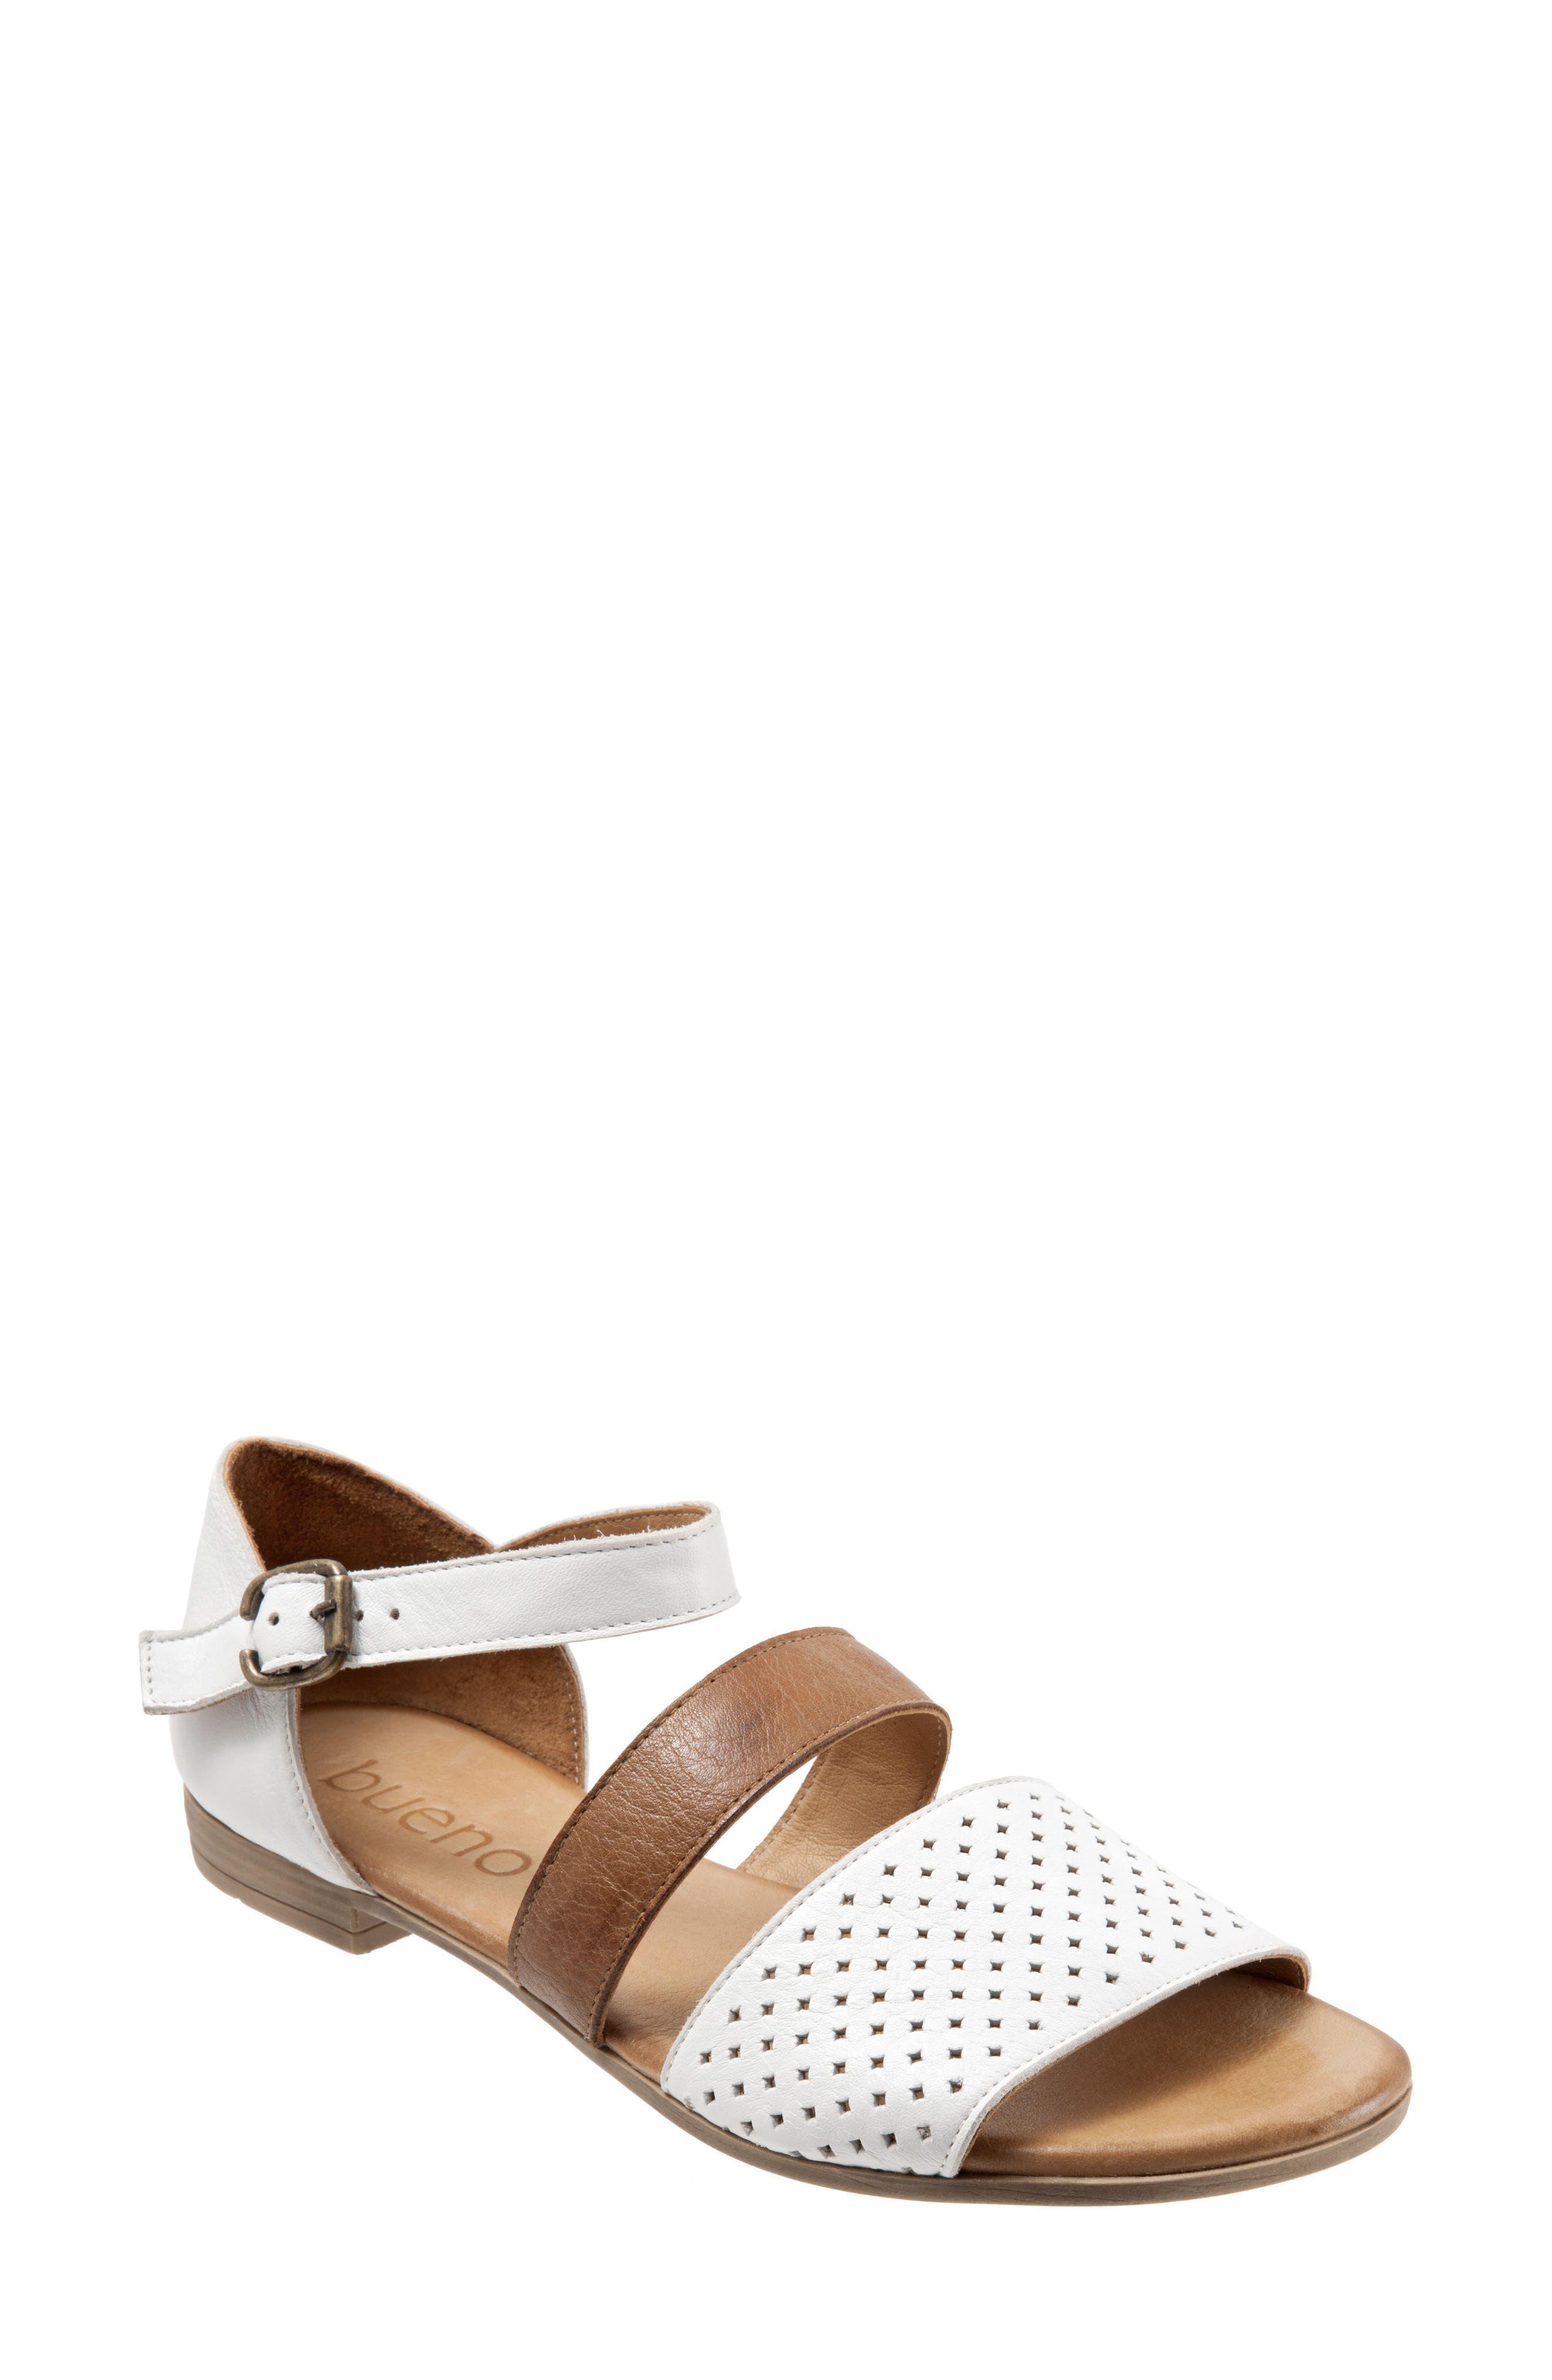 Bueno Janet Perforated Flat Sandal, White